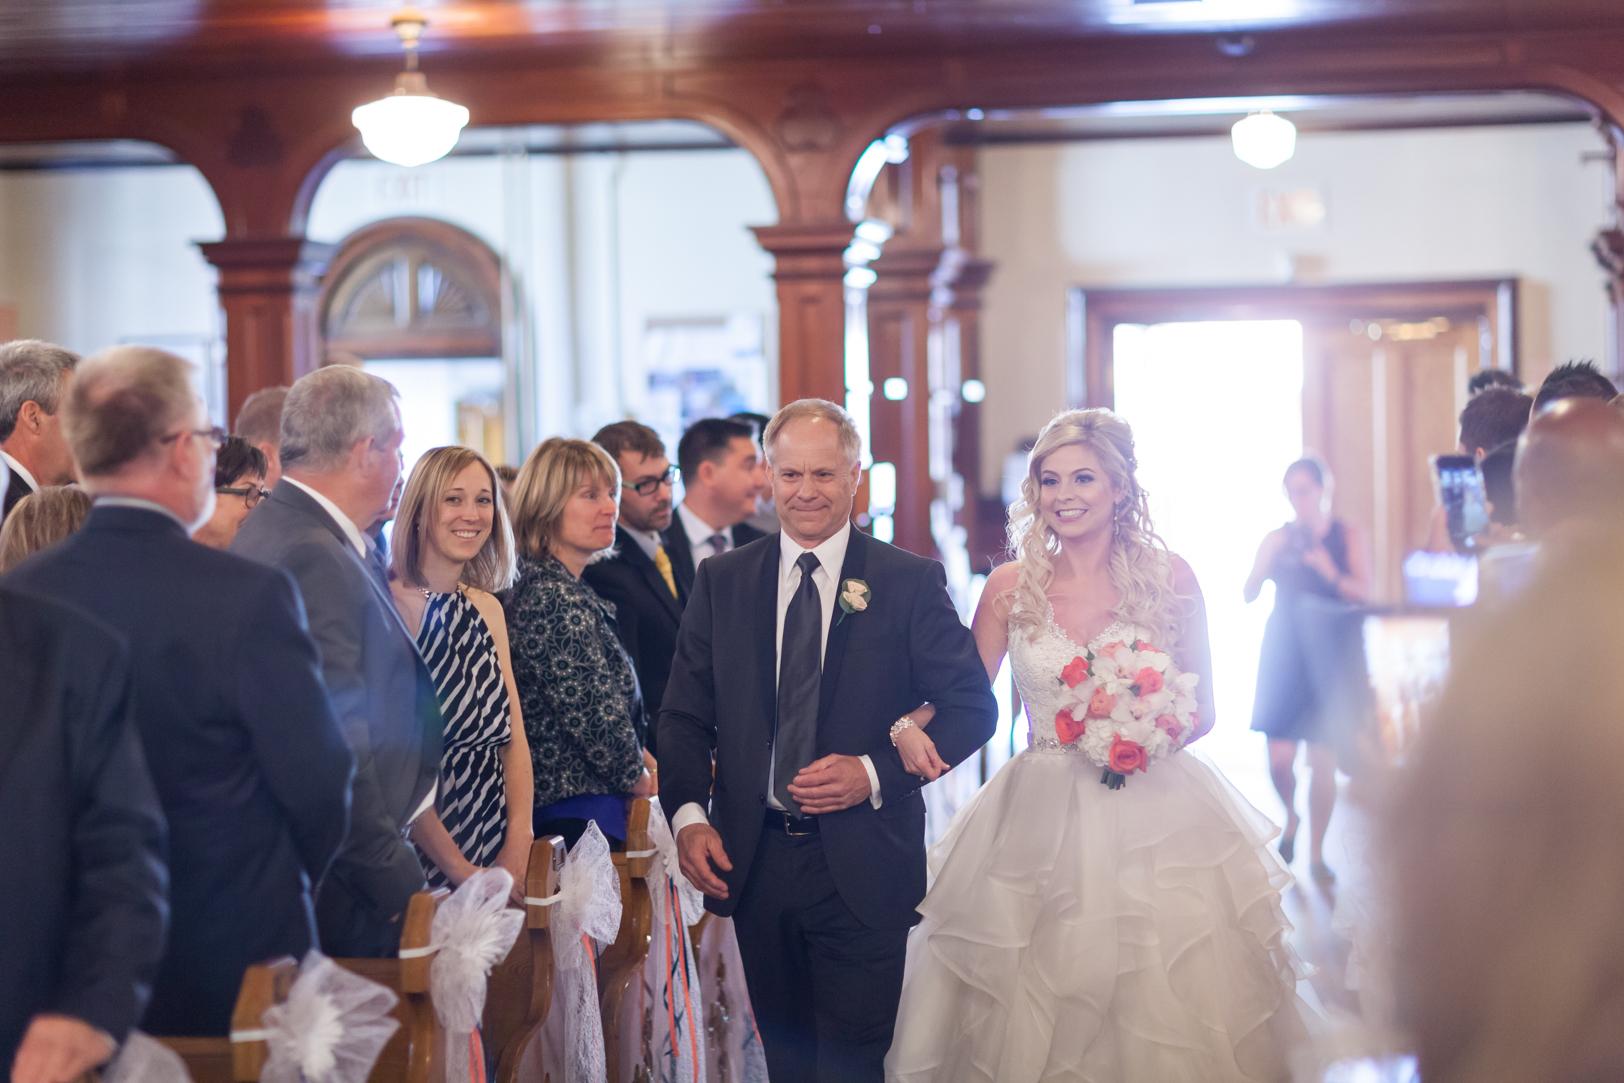 wedding procession photos